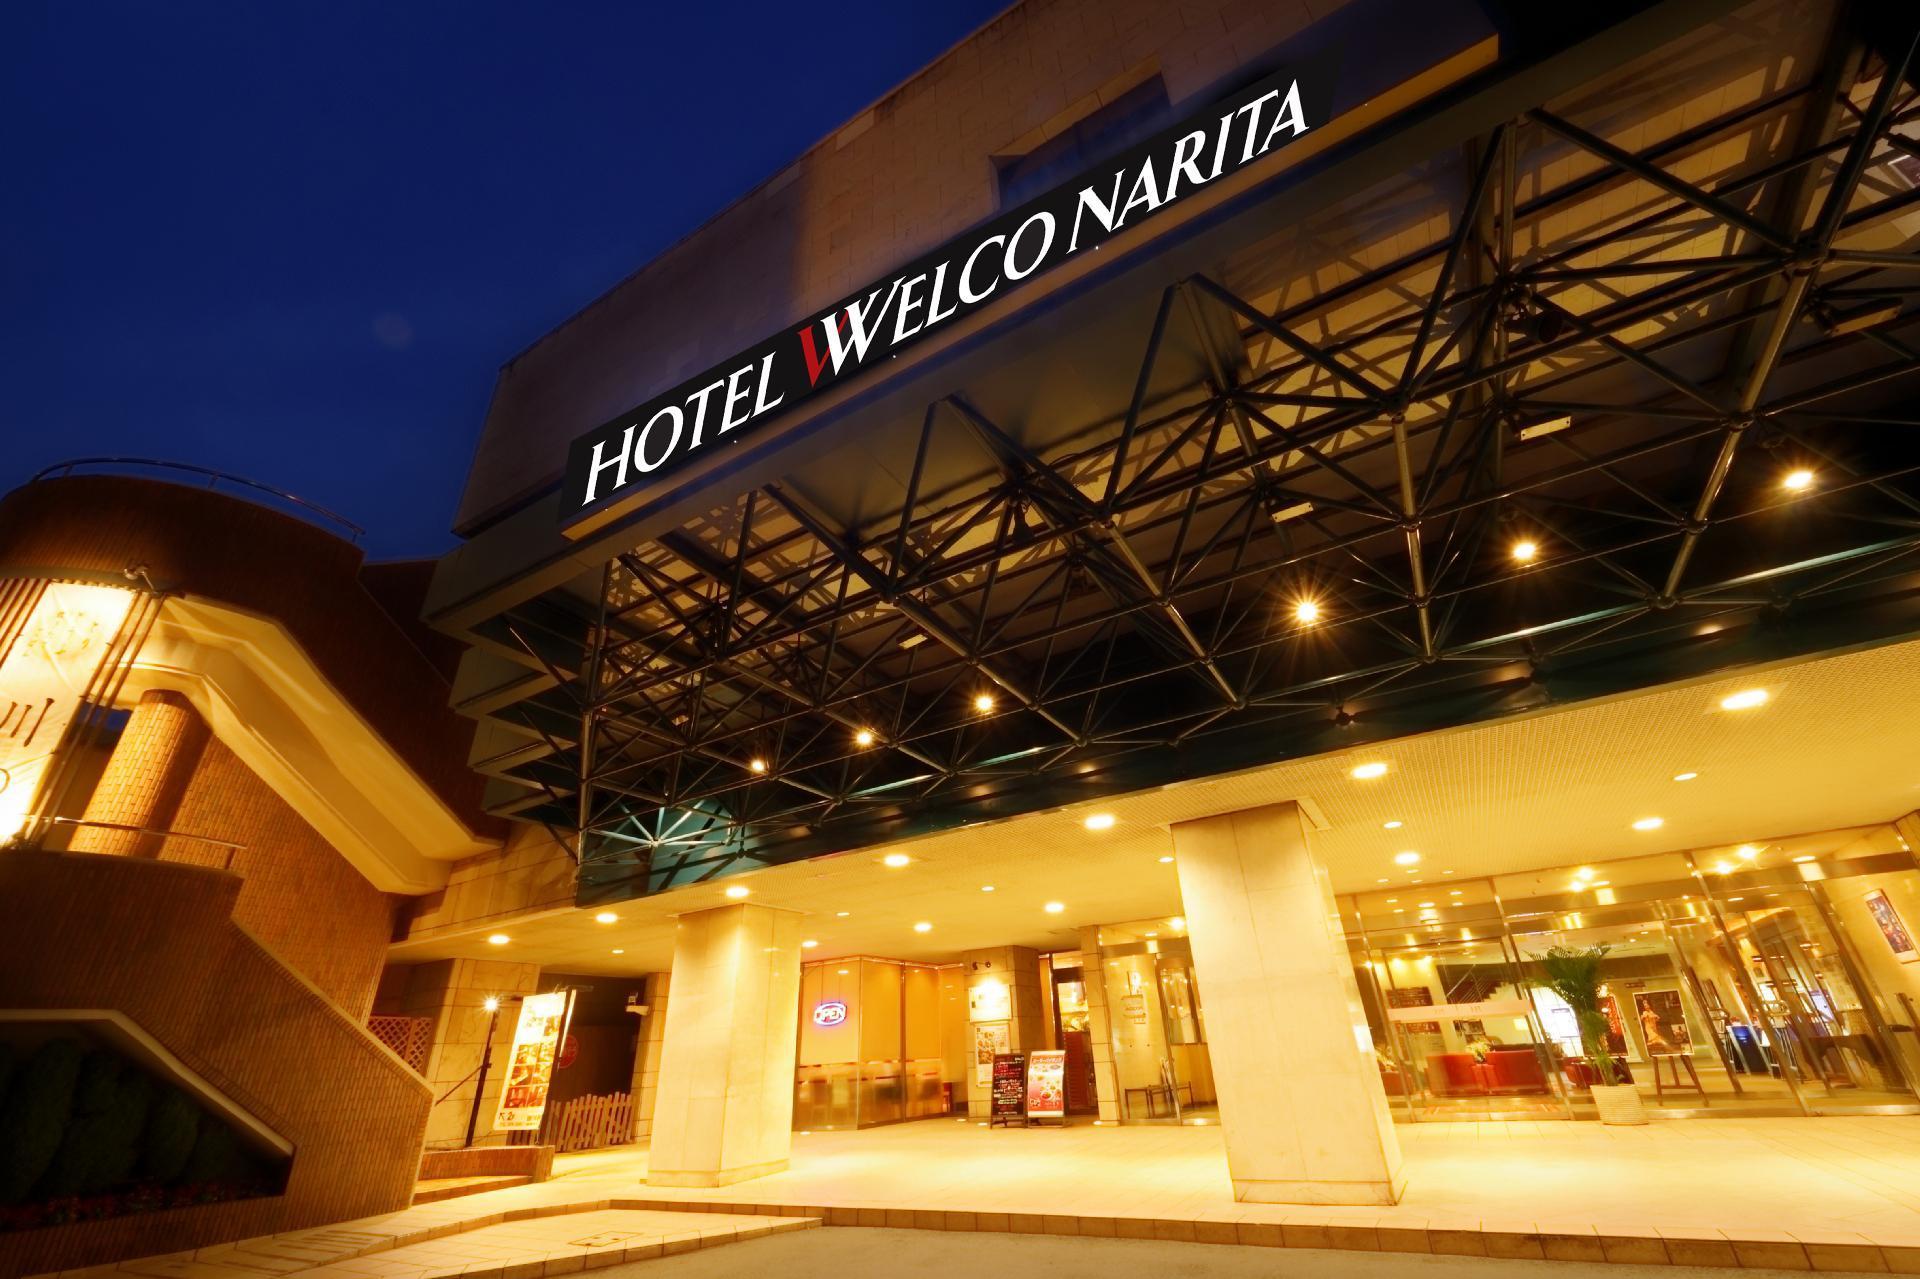 Hotel Welco Narita ( Formerly Mercure Hotel Narita ), Narita